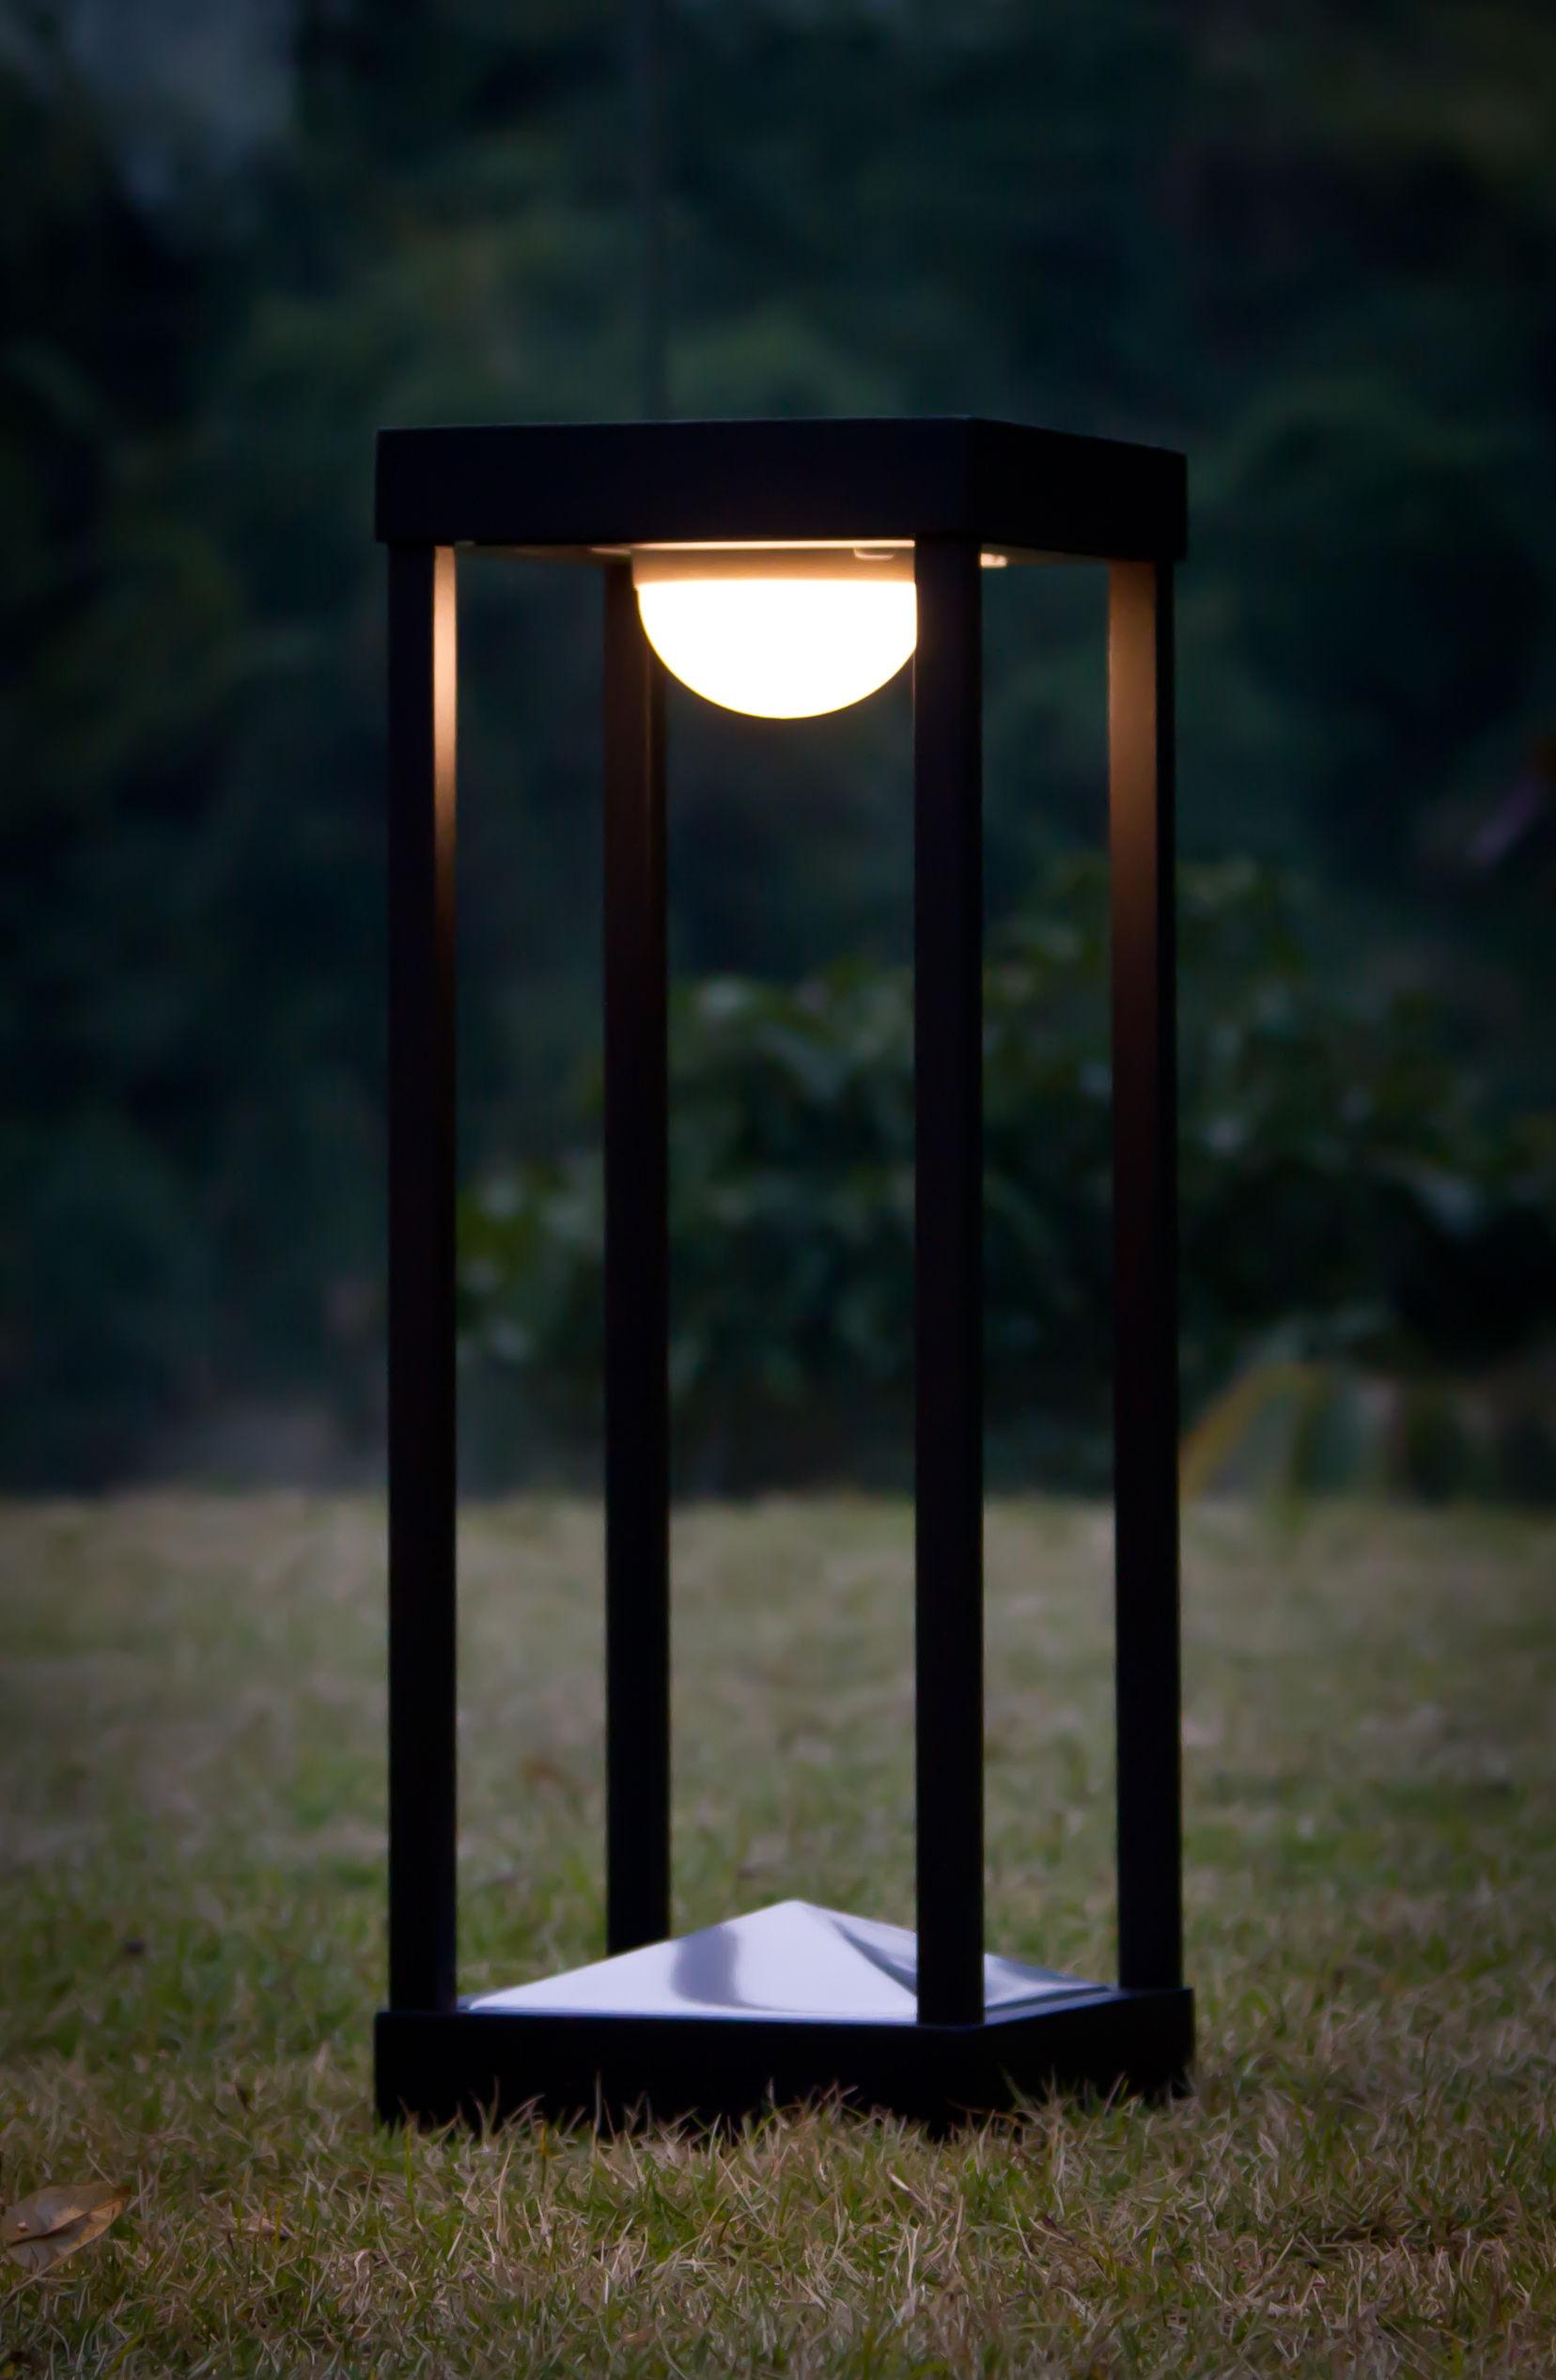 la lampe parc m solar lamp led wireless h 40 cm black by maiori. Black Bedroom Furniture Sets. Home Design Ideas